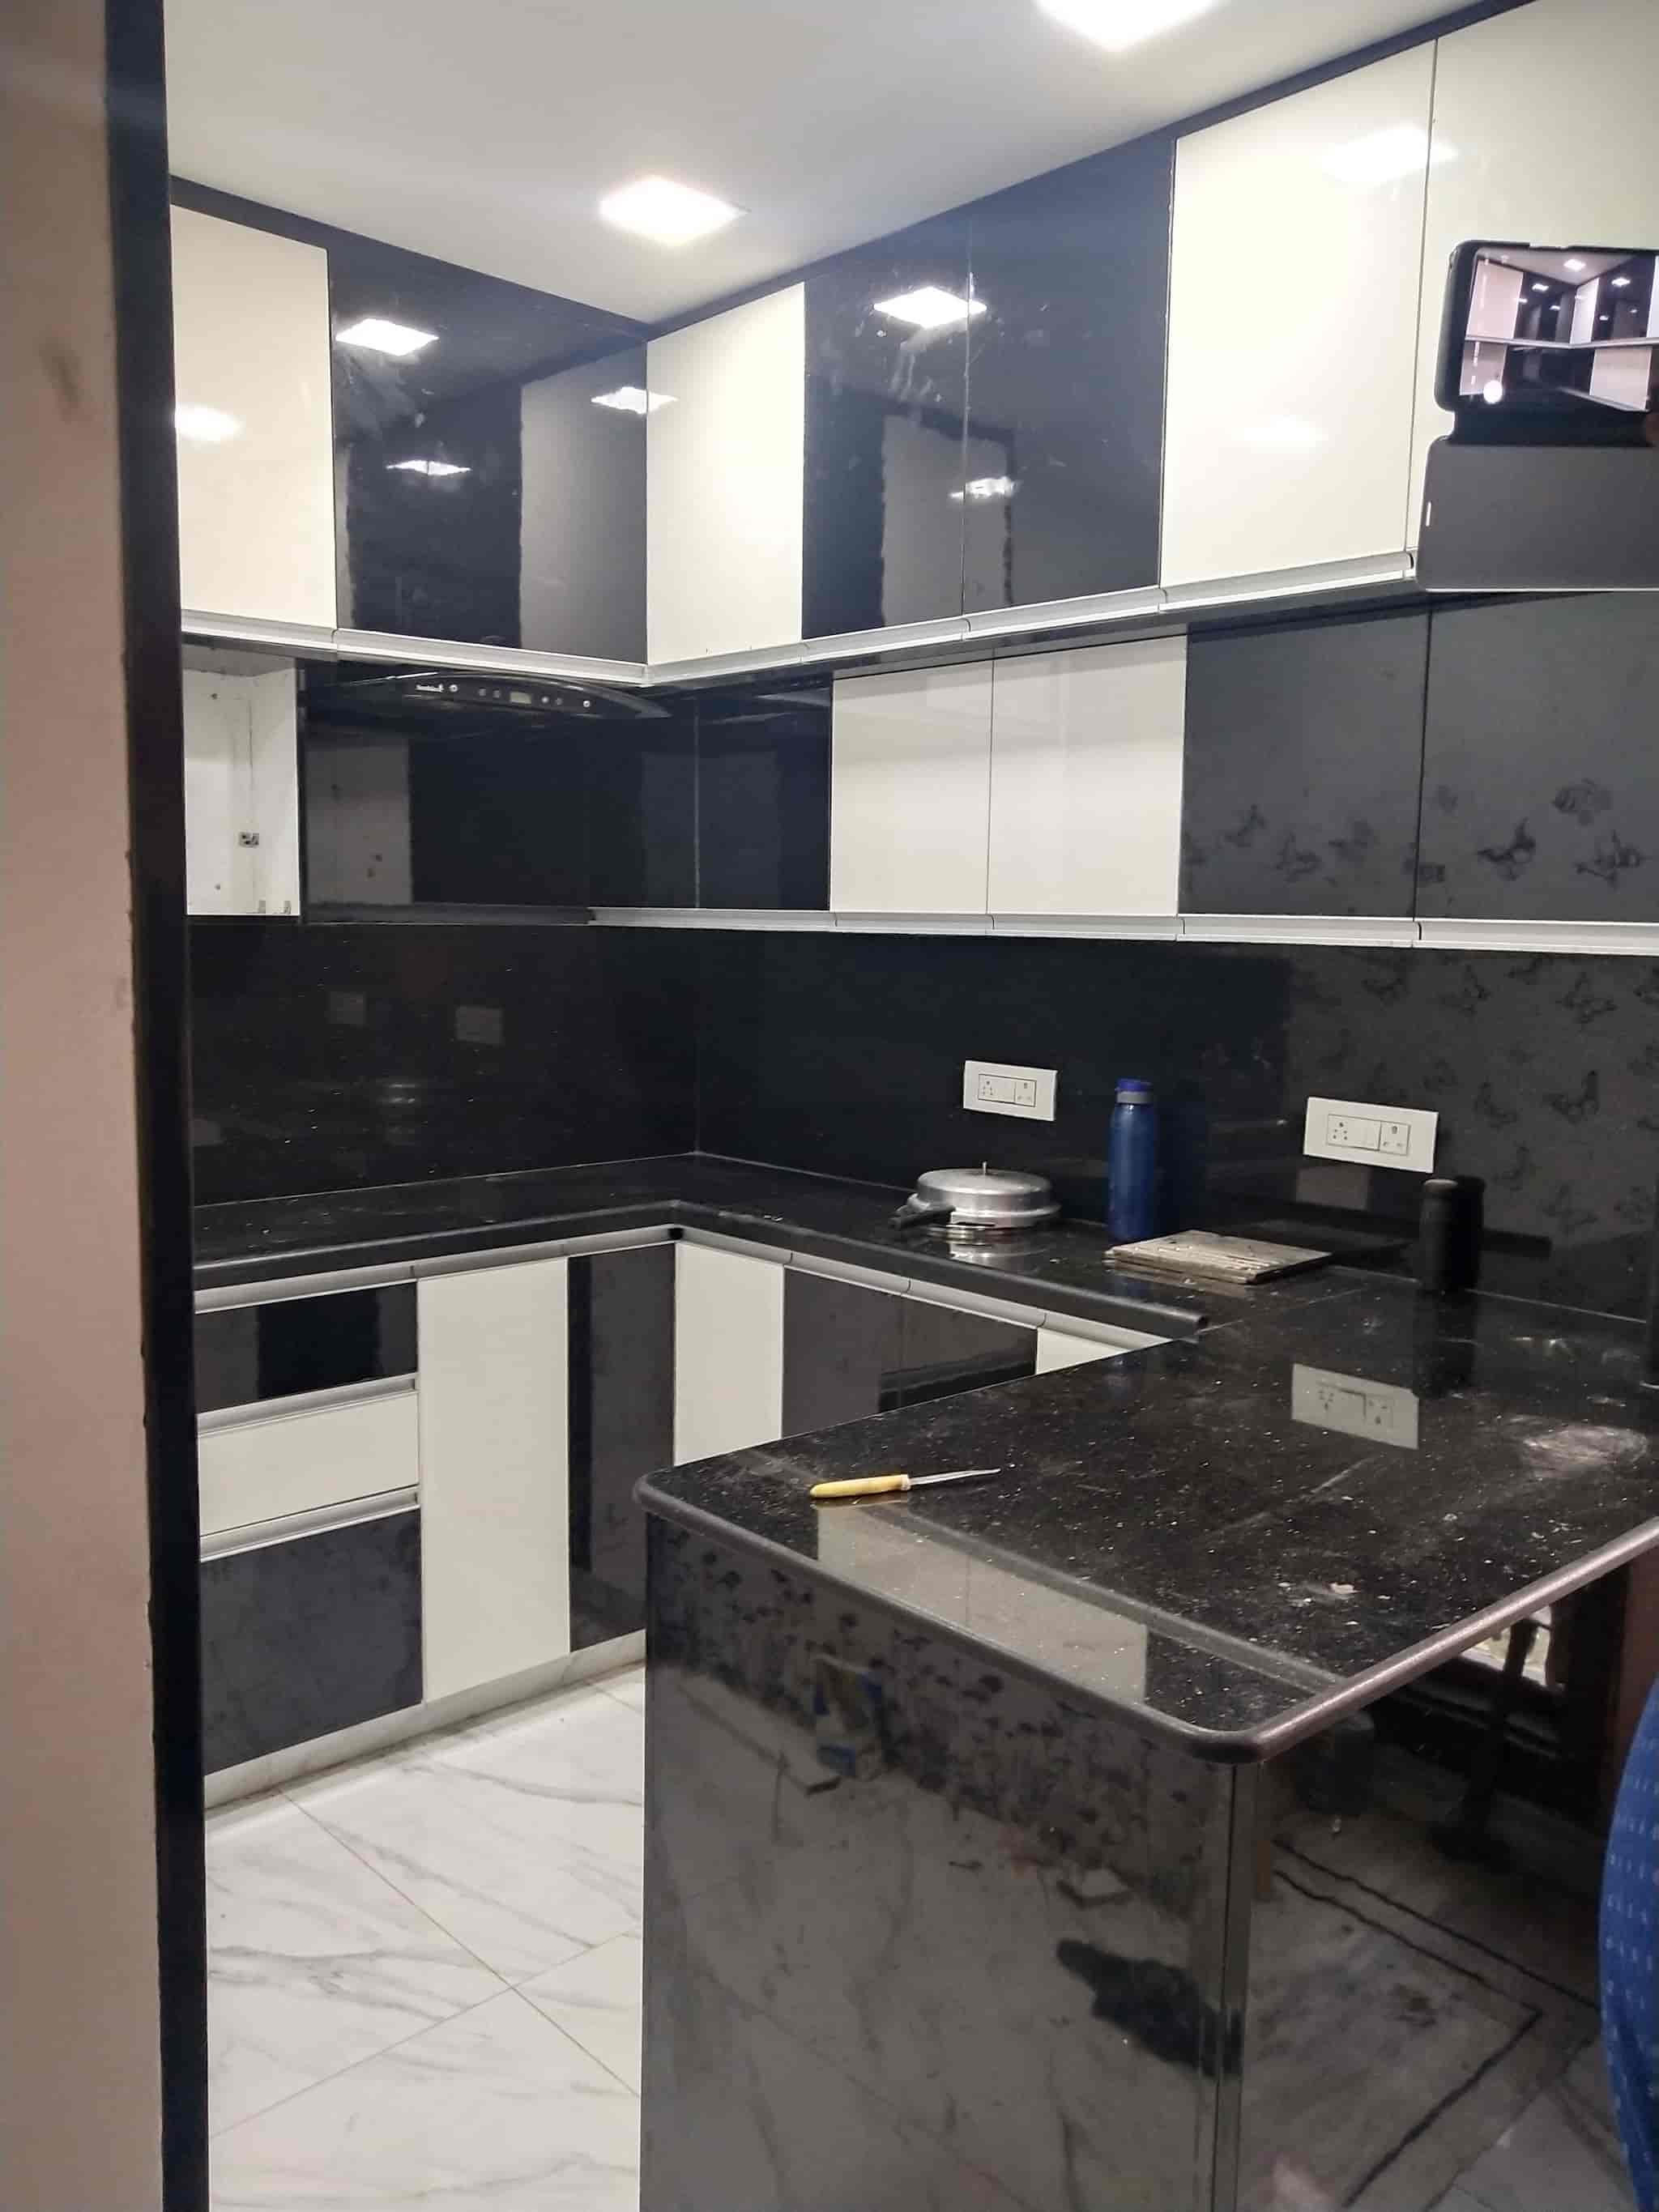 Top 20 Modular Kitchen Dealers In Donka Road Best Modular Kitchen Showroom Justdial